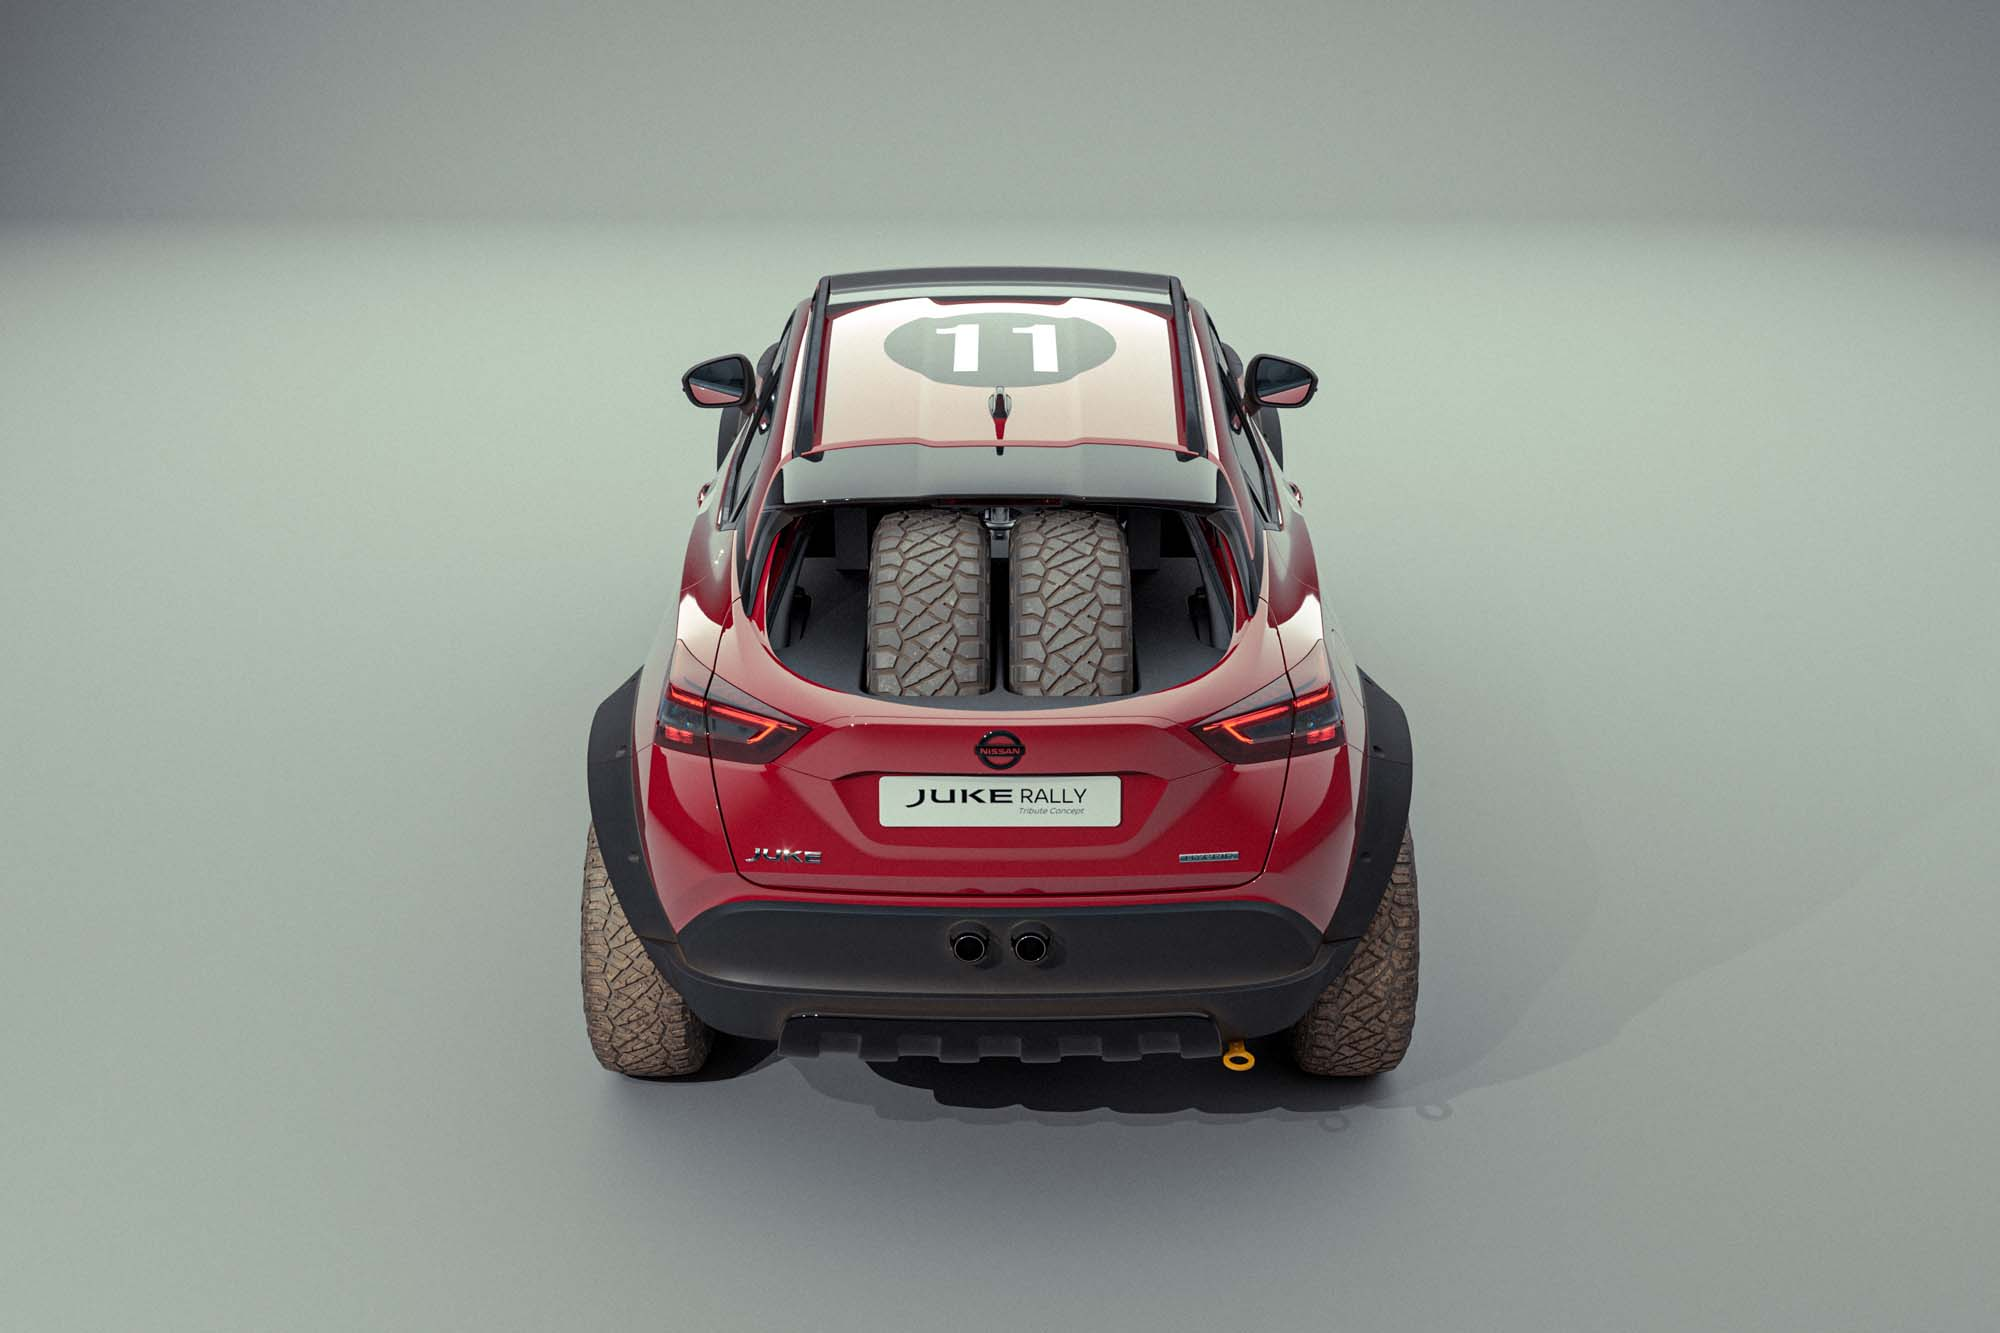 JUKE Rally Heritage Concept 3.JPG Πώς σου φαίνεται αυτό το Nissan Juke Rally; Nissan, Nissan Juke, zblog, ειδήσεις, Νέα